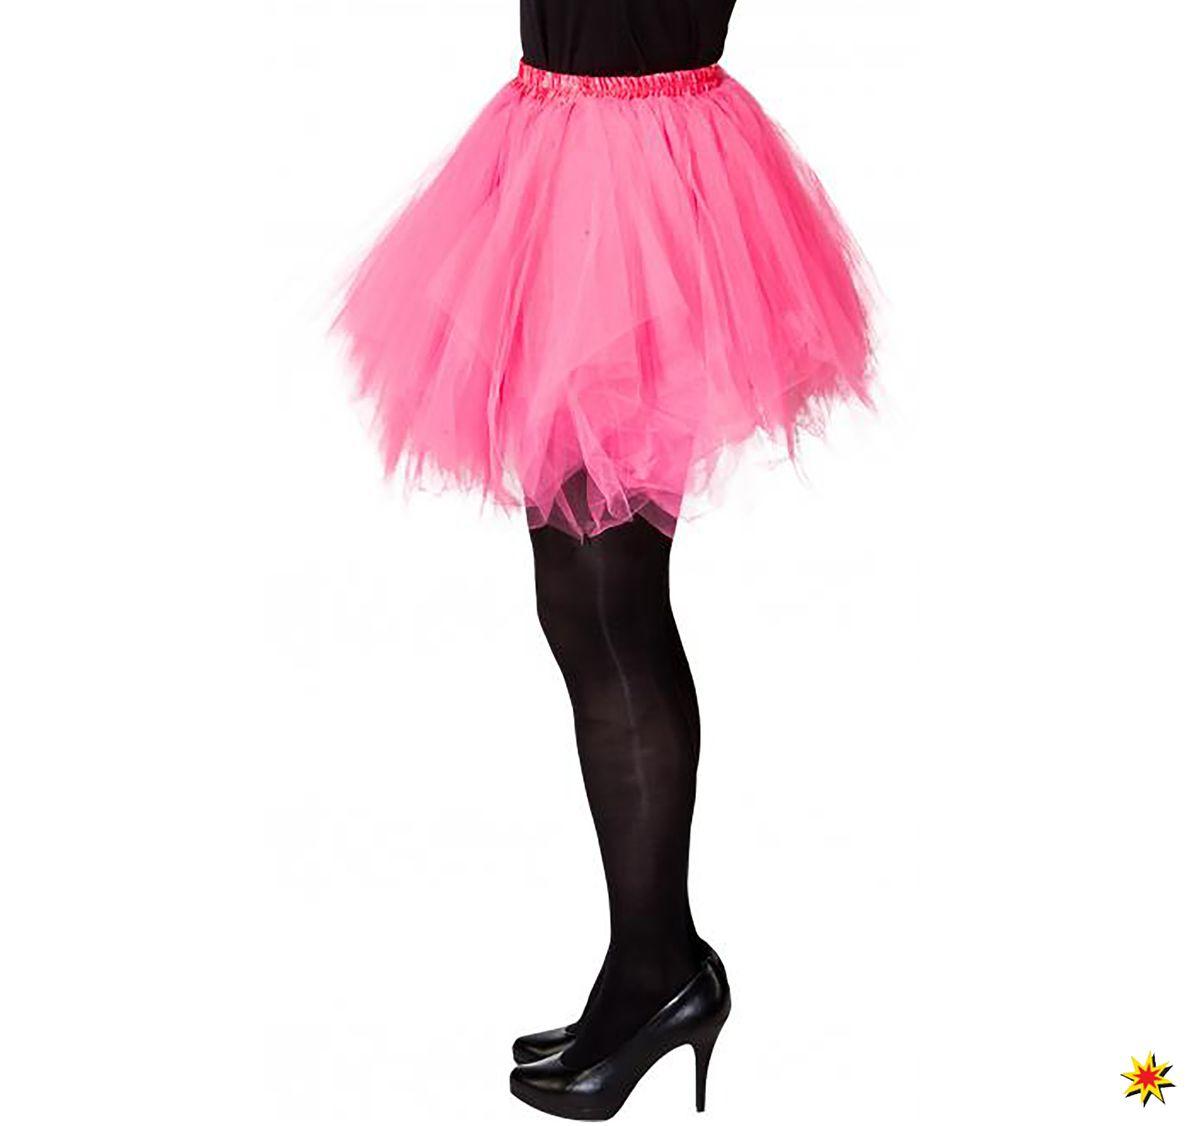 outlet store 0f324 35e92 Damen Kostüm Rock Tutu rosa Flamingo